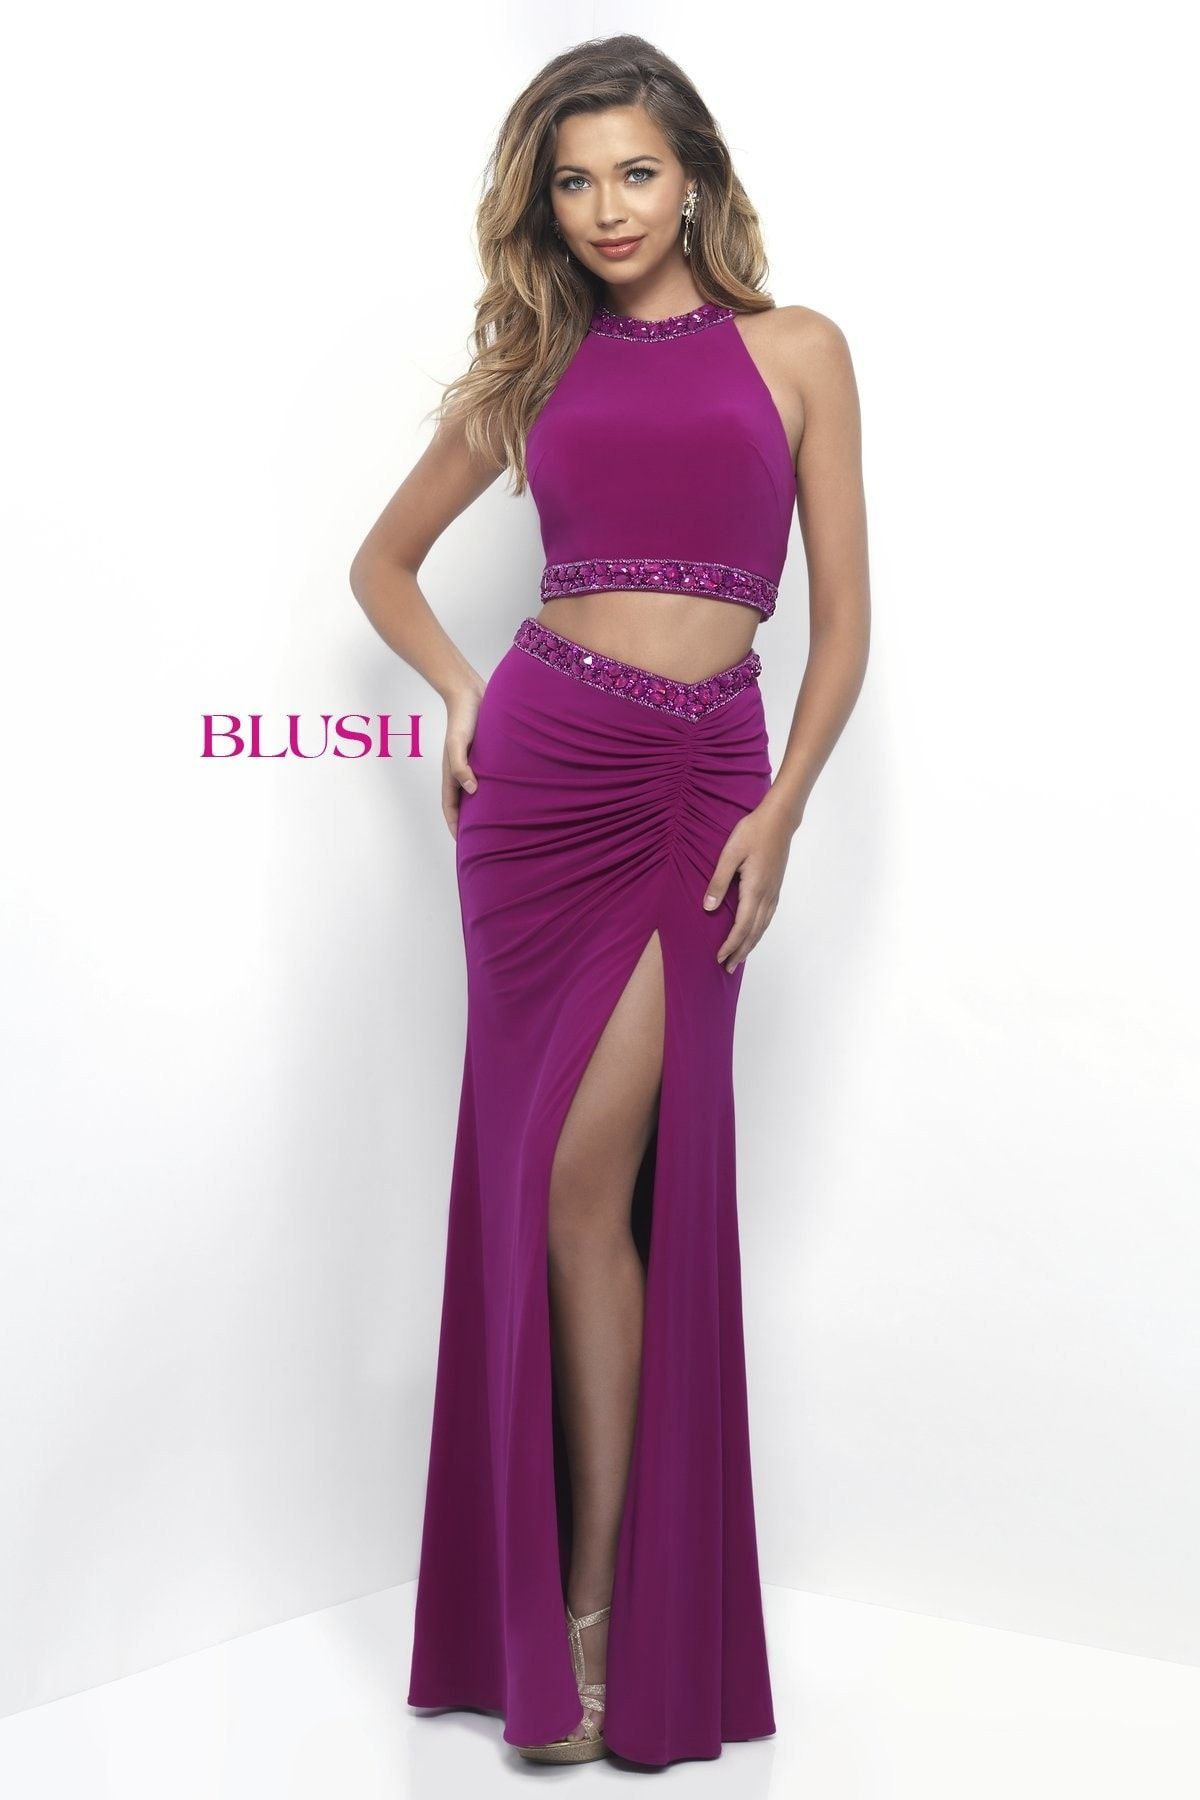 Blush Prom 11284 Magenta Halter Jersey Prom Dress | Products | Pinterest